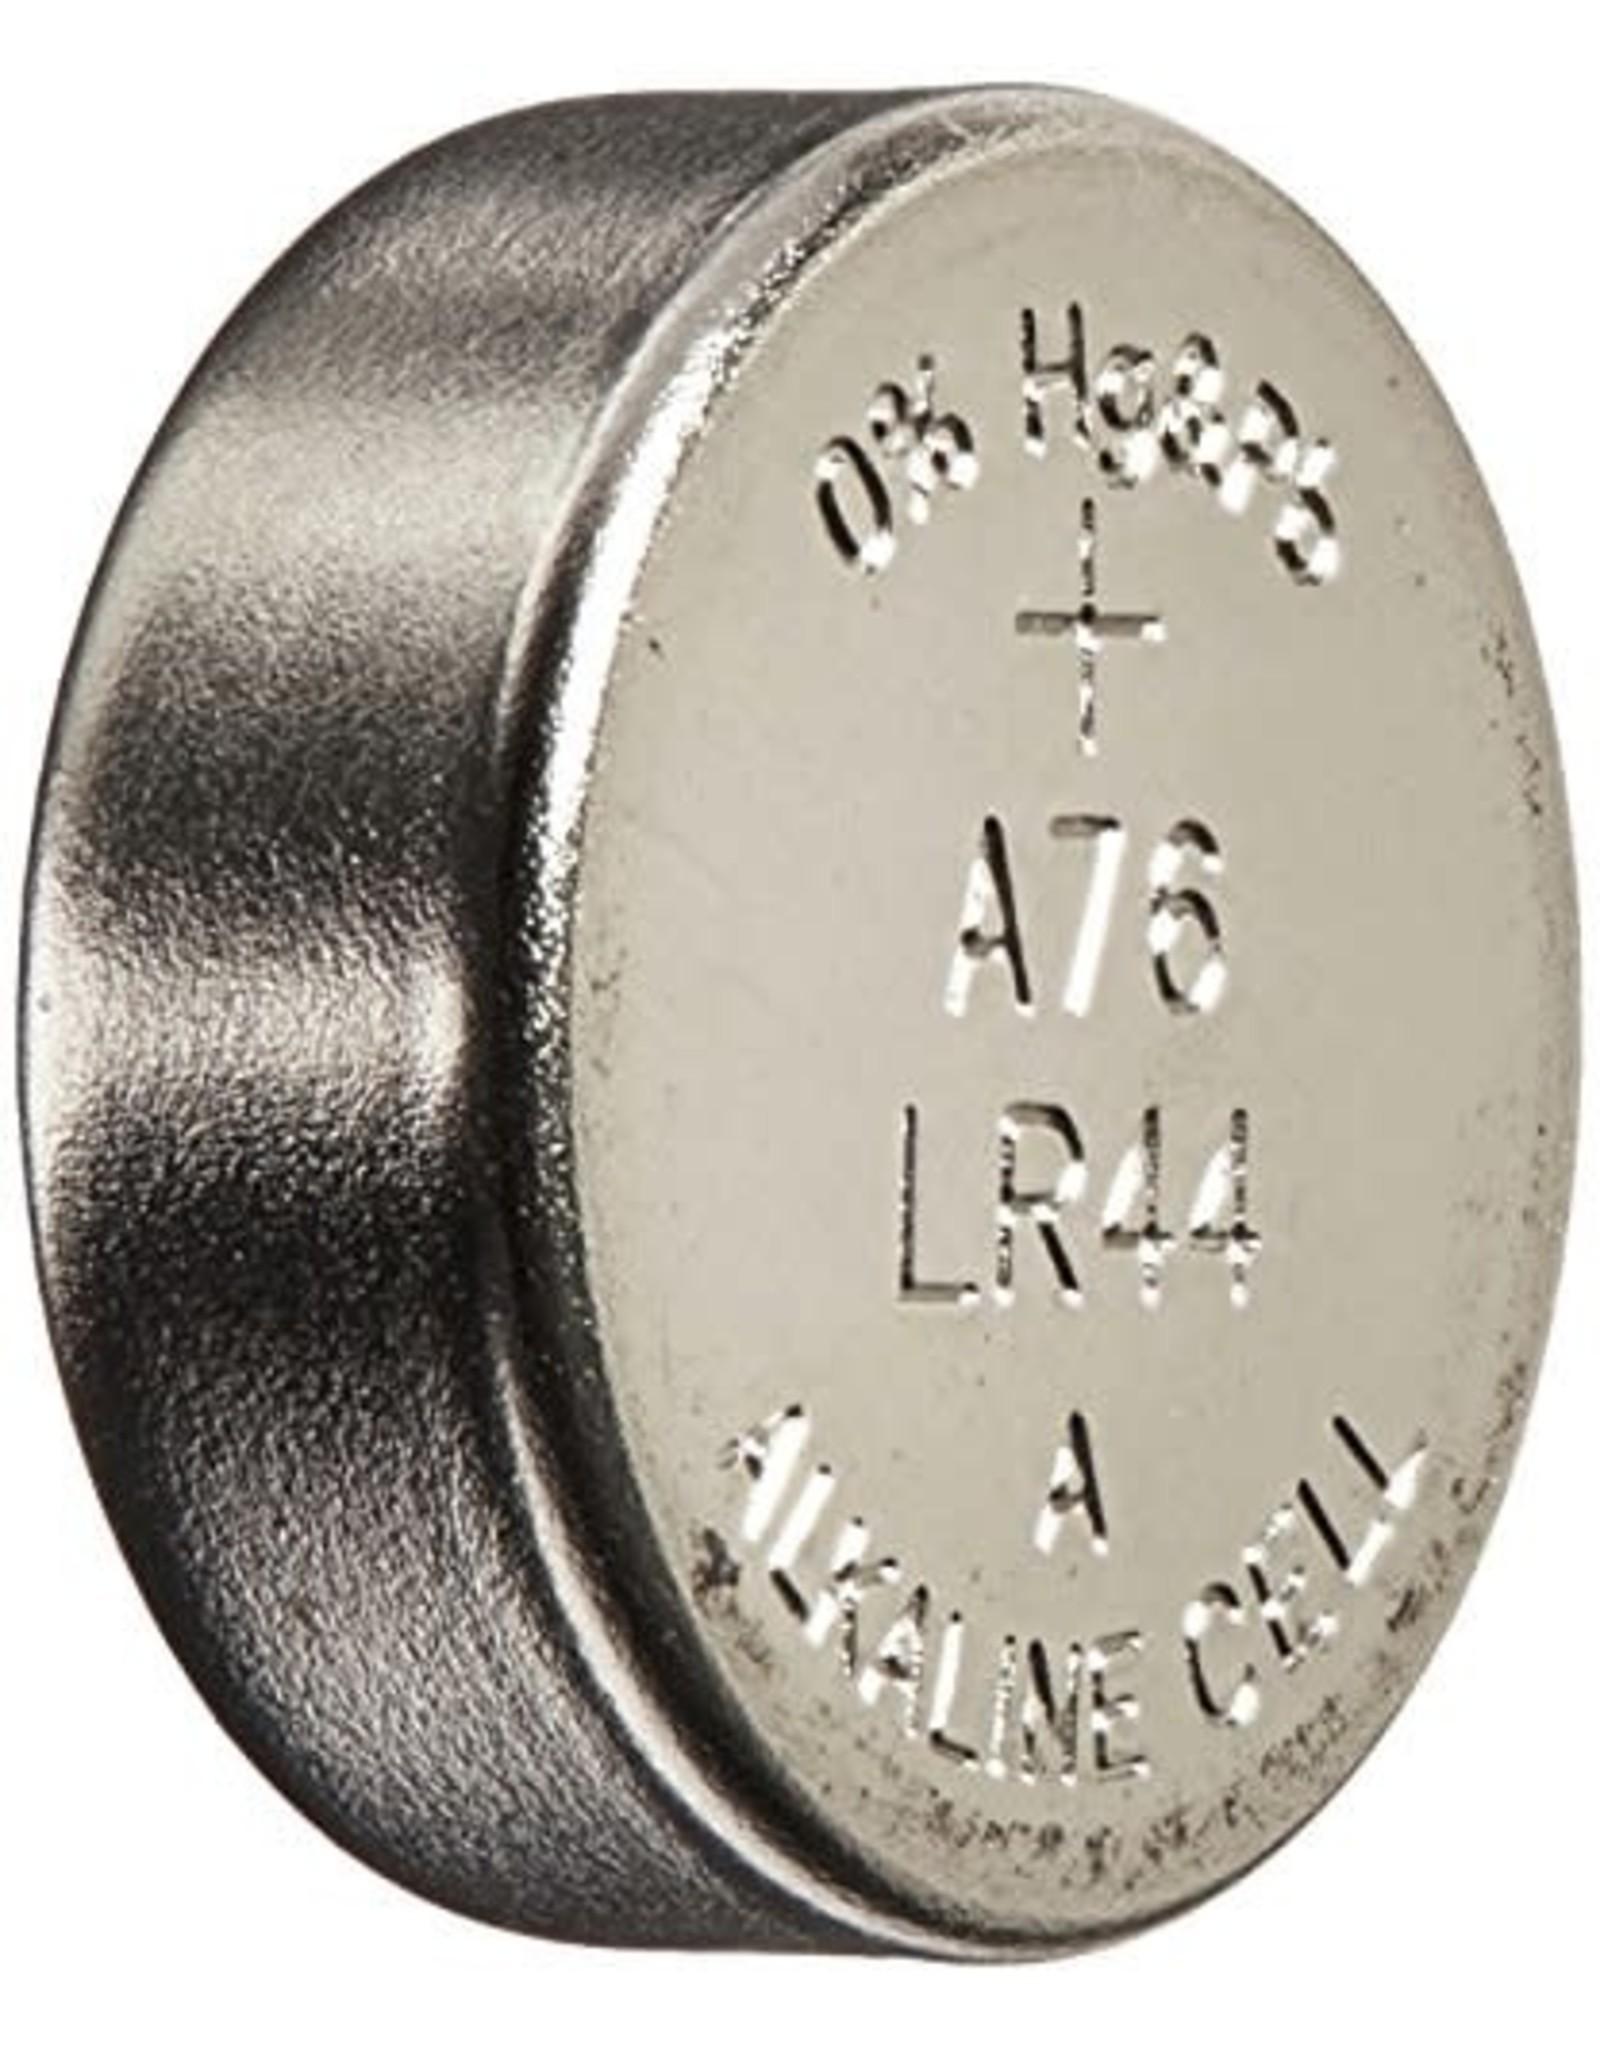 Duracell Duracell 76A 1.5V Button Battery 1 Pack